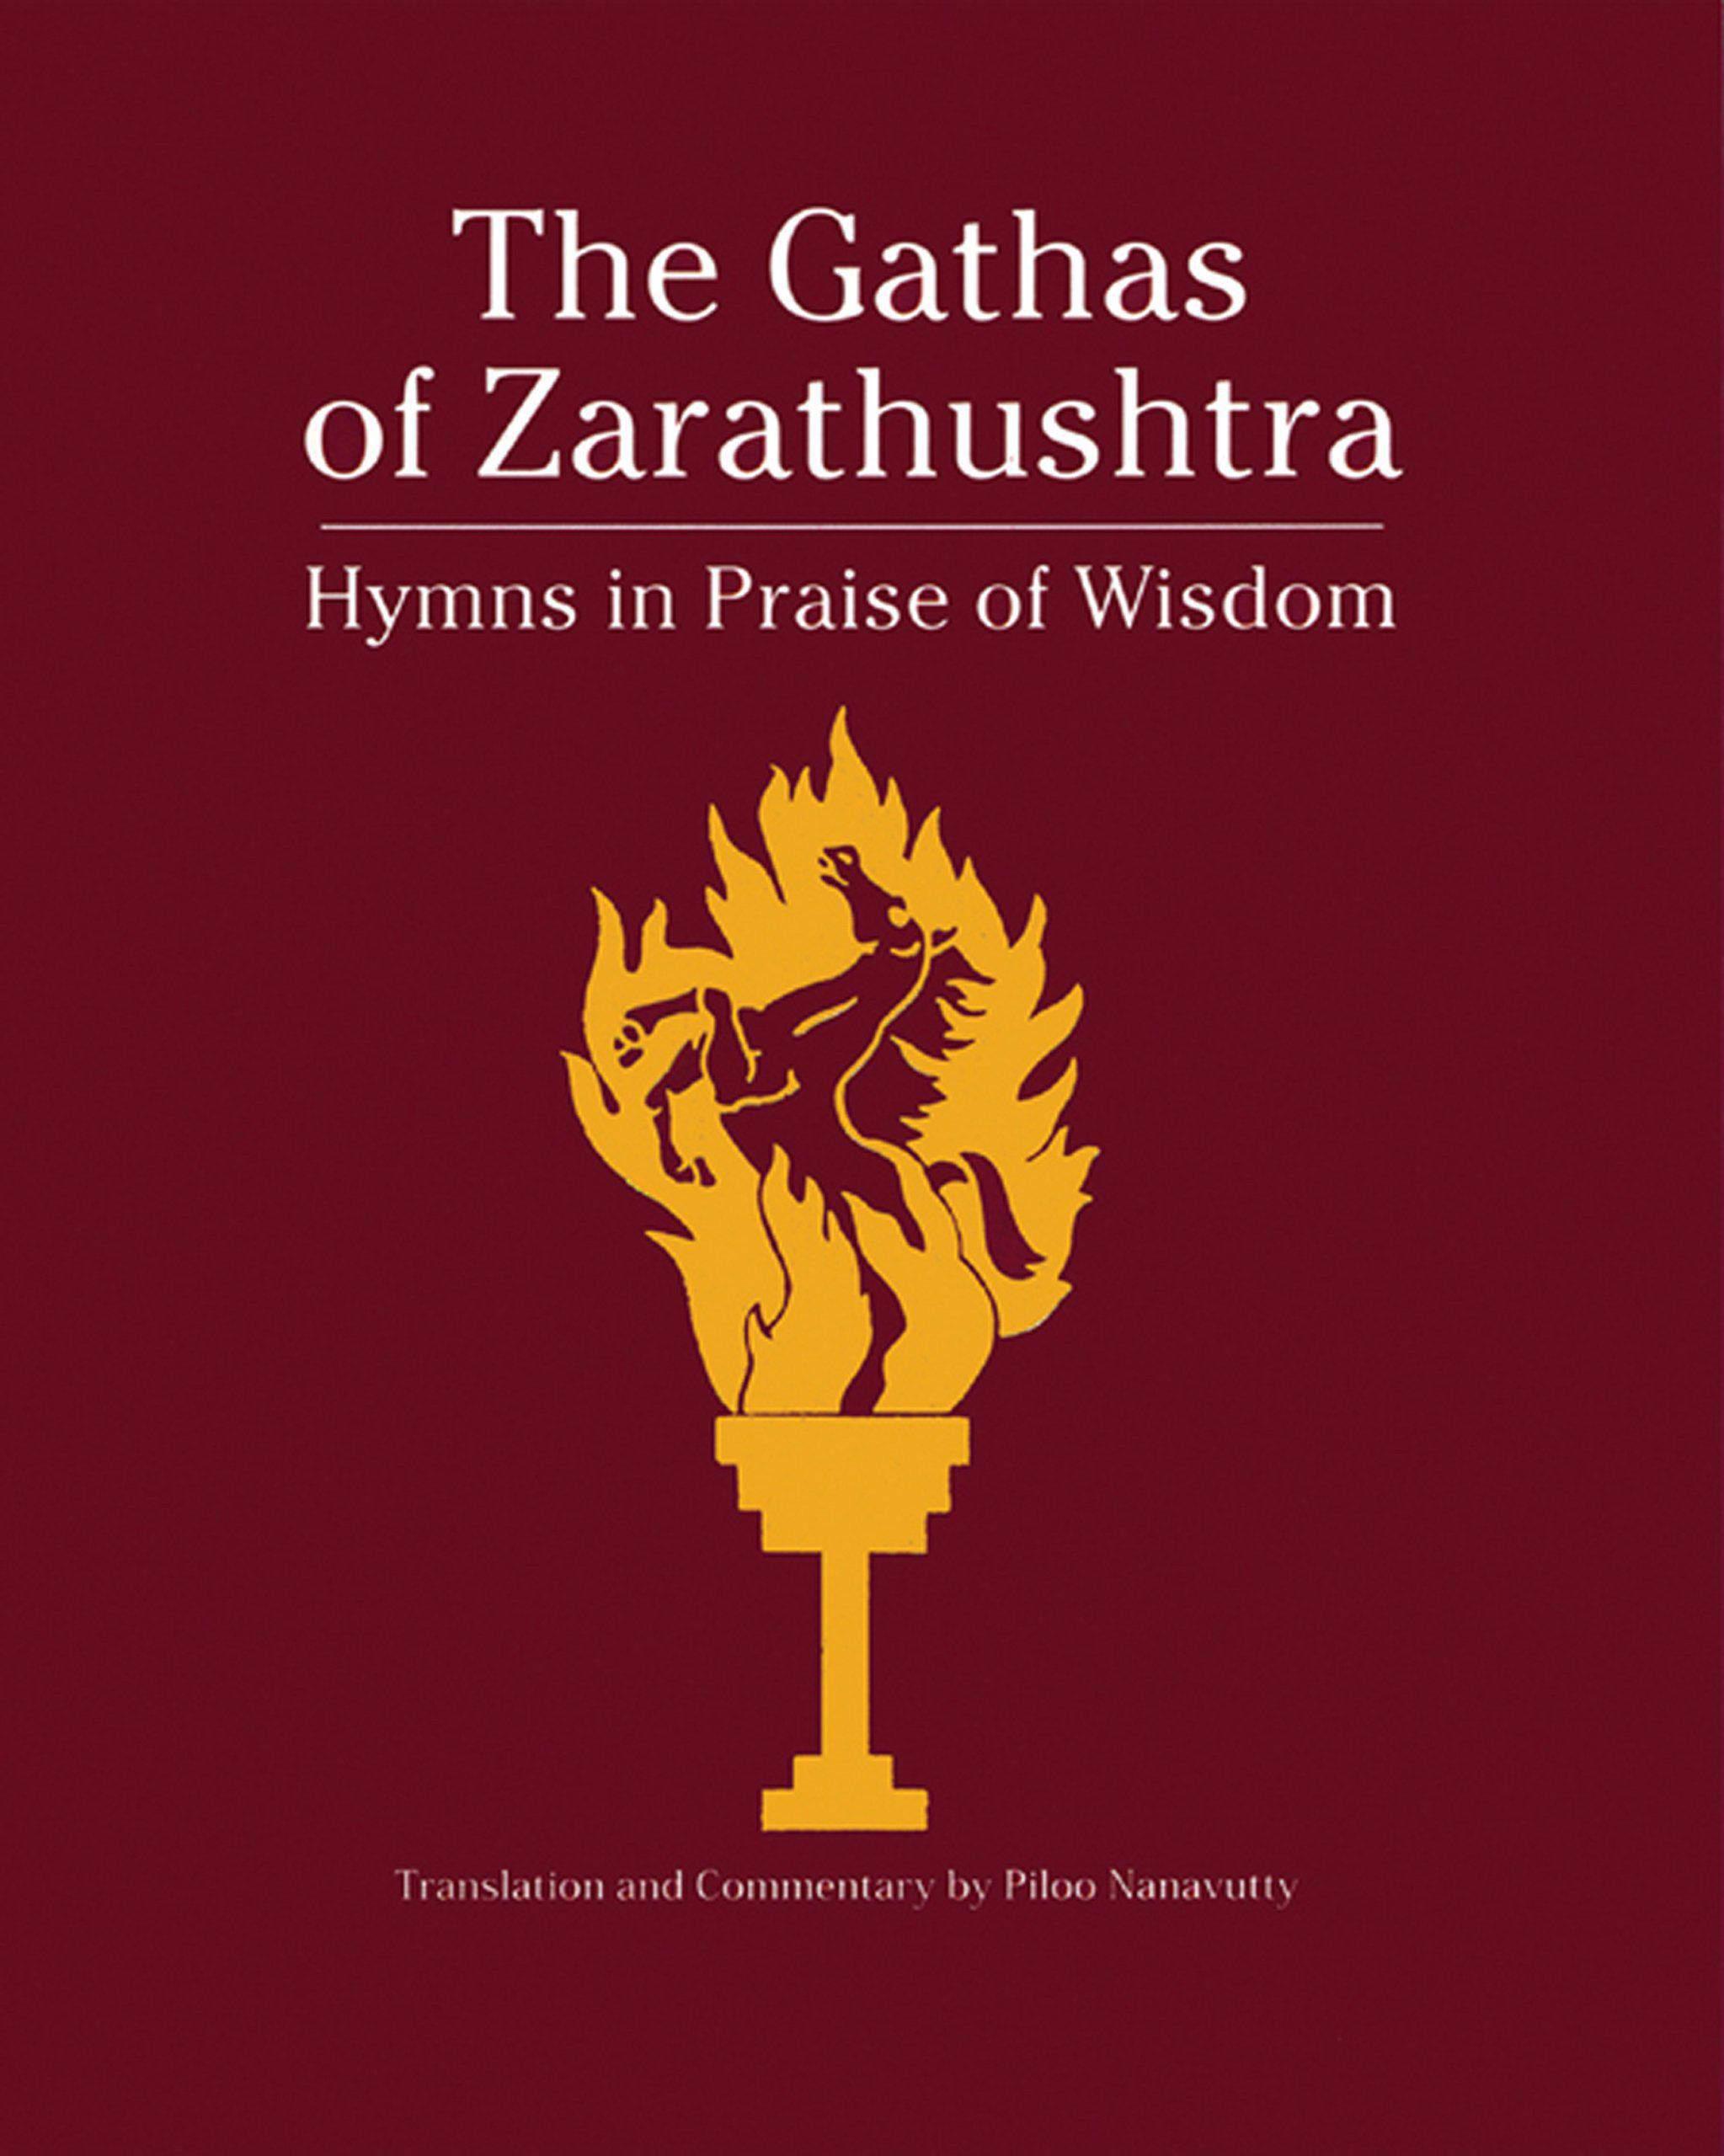 The Gathas of Zarathustra: Hymns in Praise of Wisdom